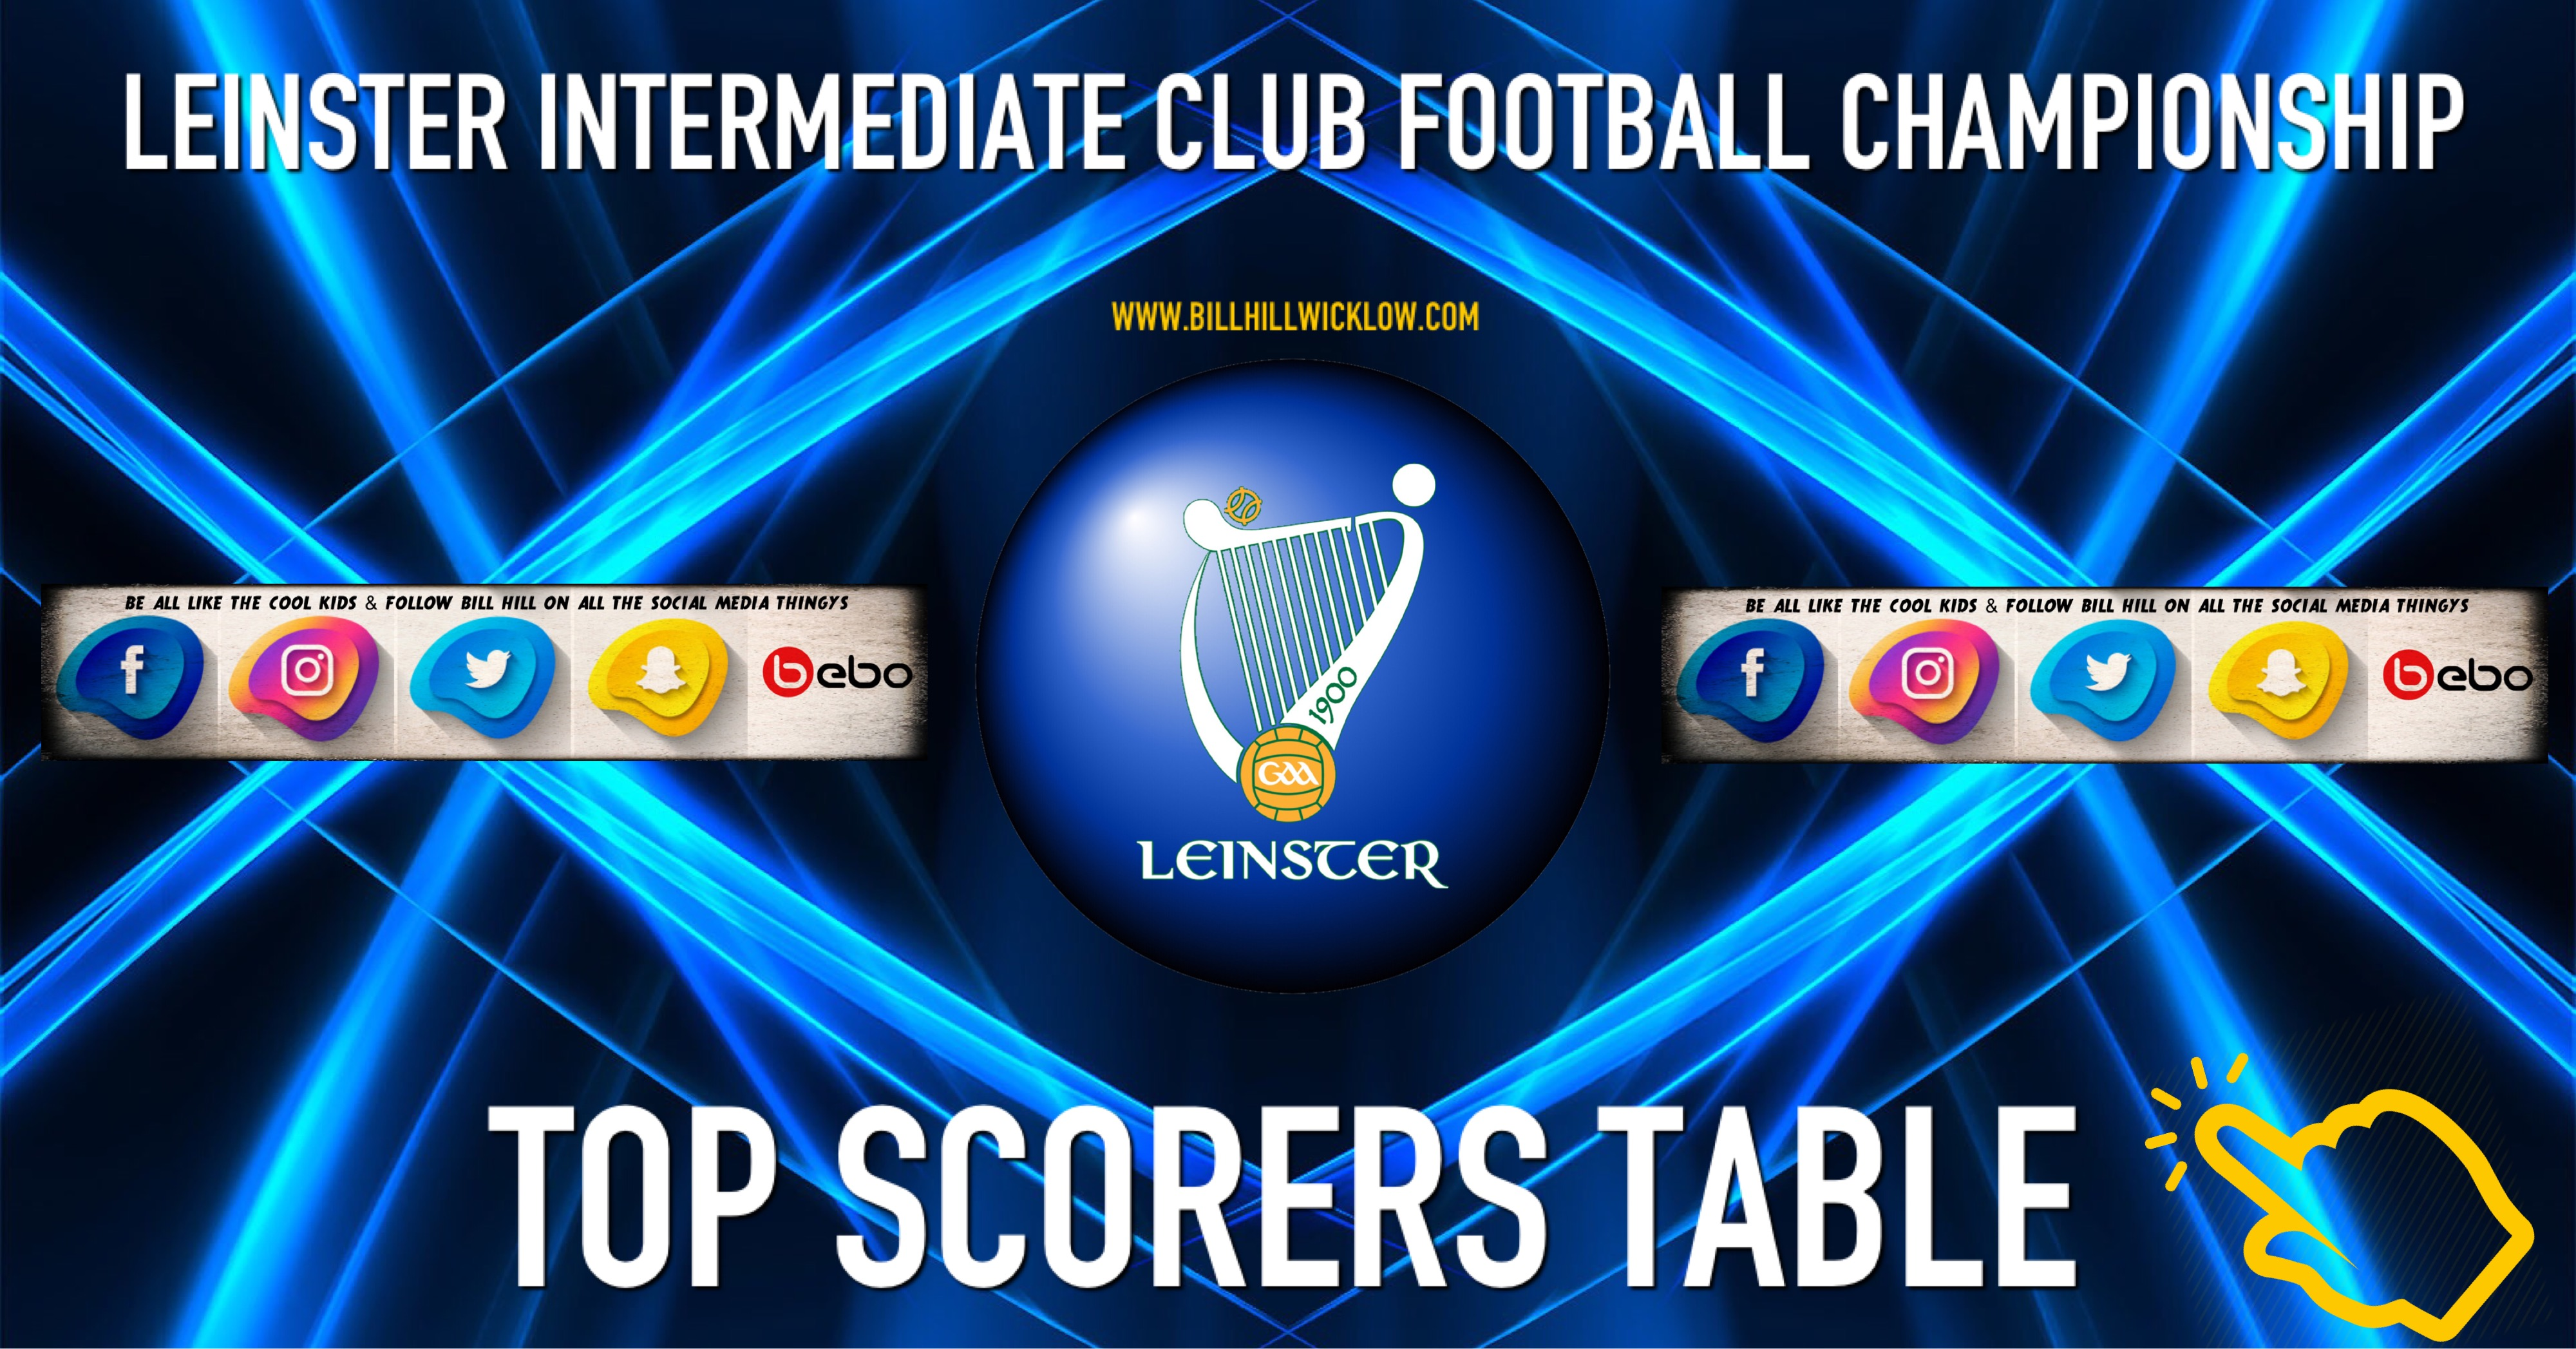 Leinster Intermediate Club Football Championship Top Scorer Table 2019